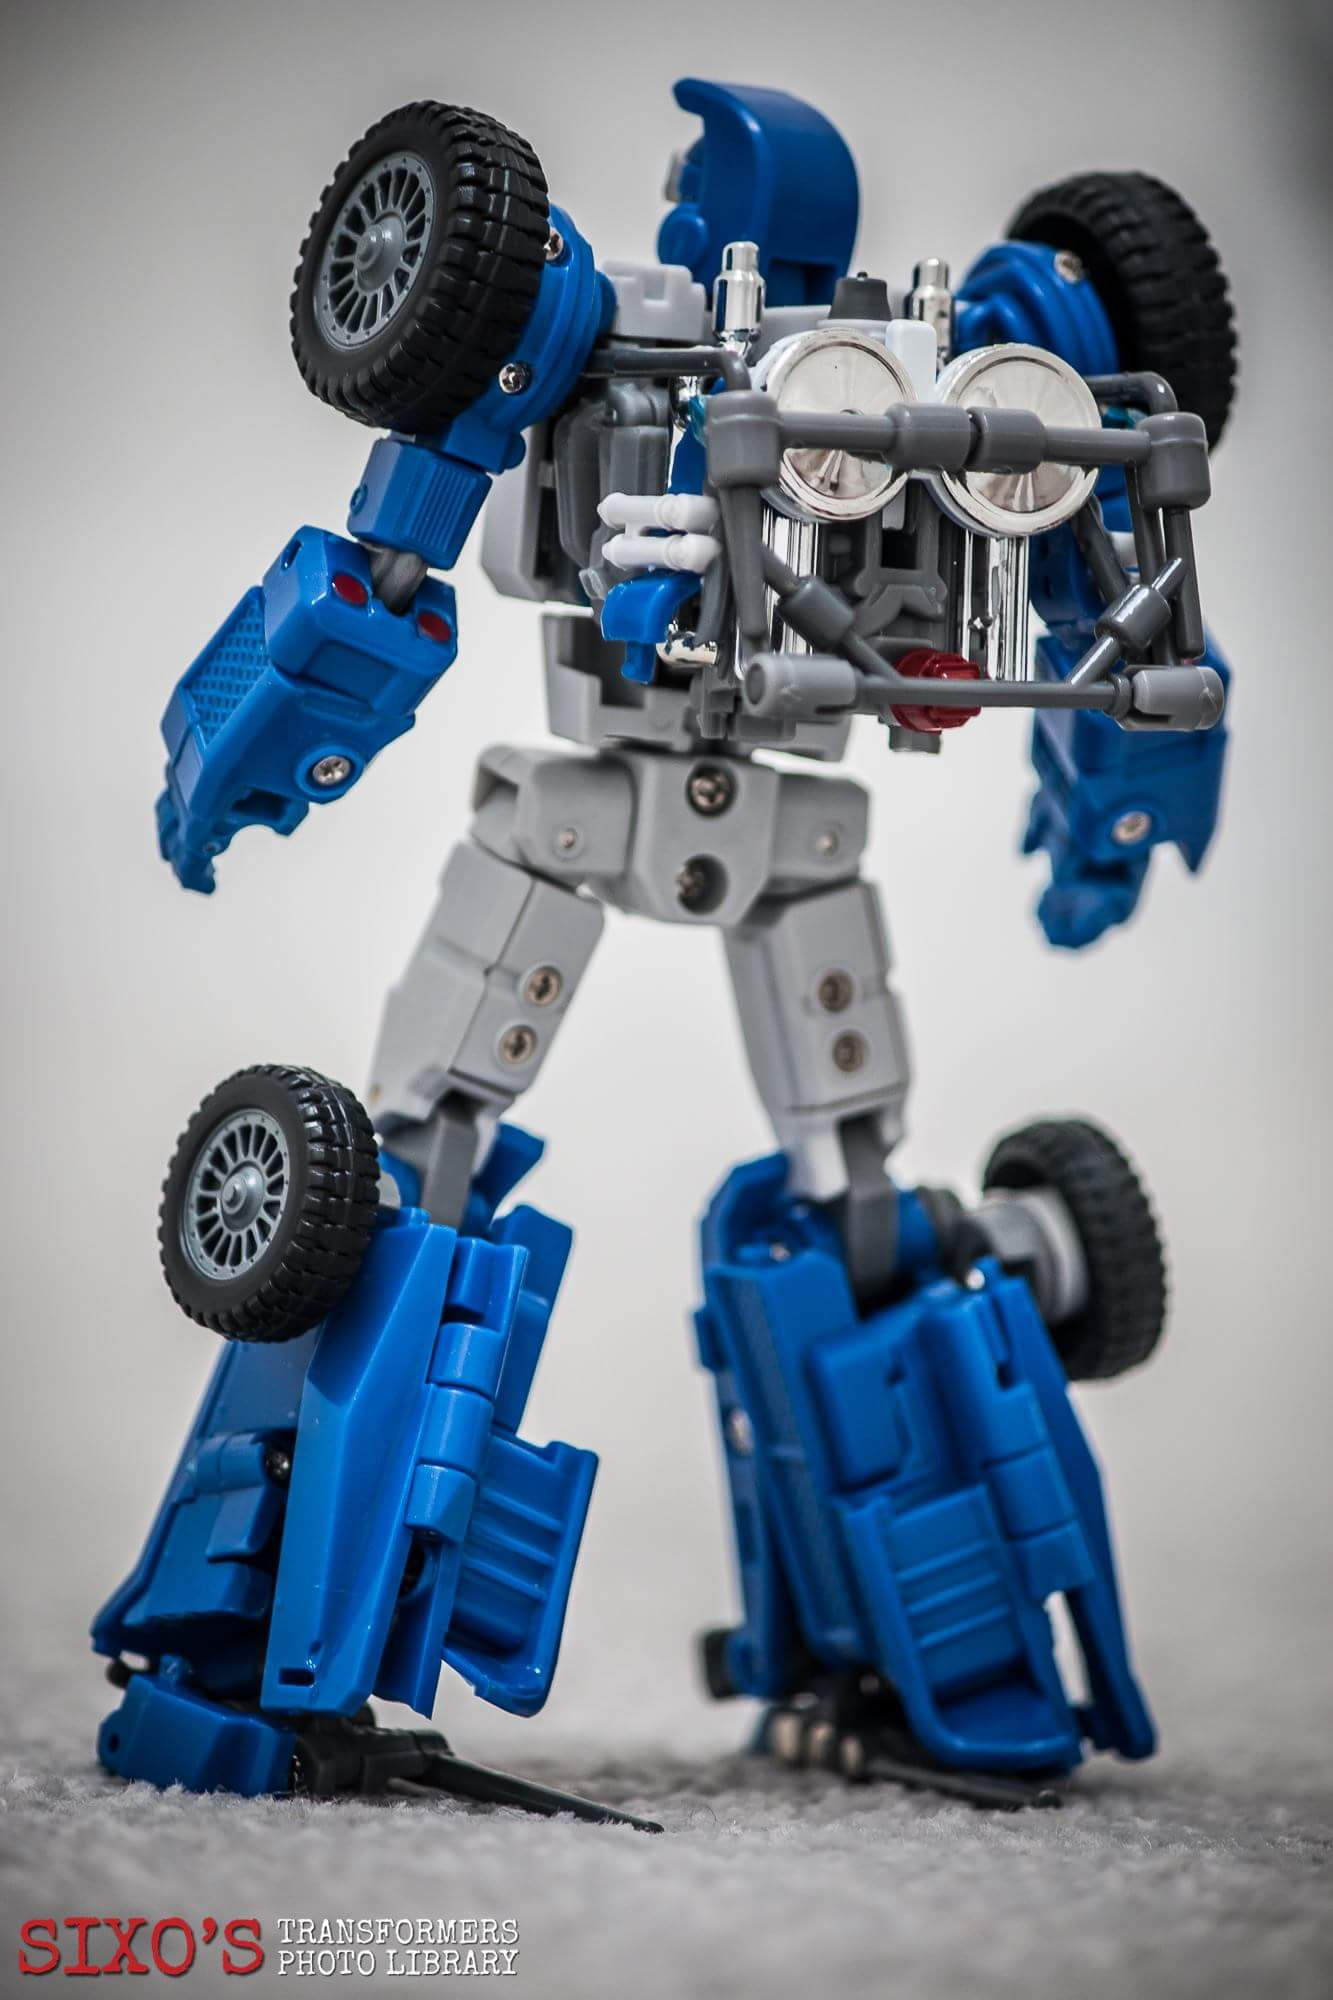 [X-Transbots] Produit Tiers - Minibots MP - Gamme MM - Page 6 1k3OYL30